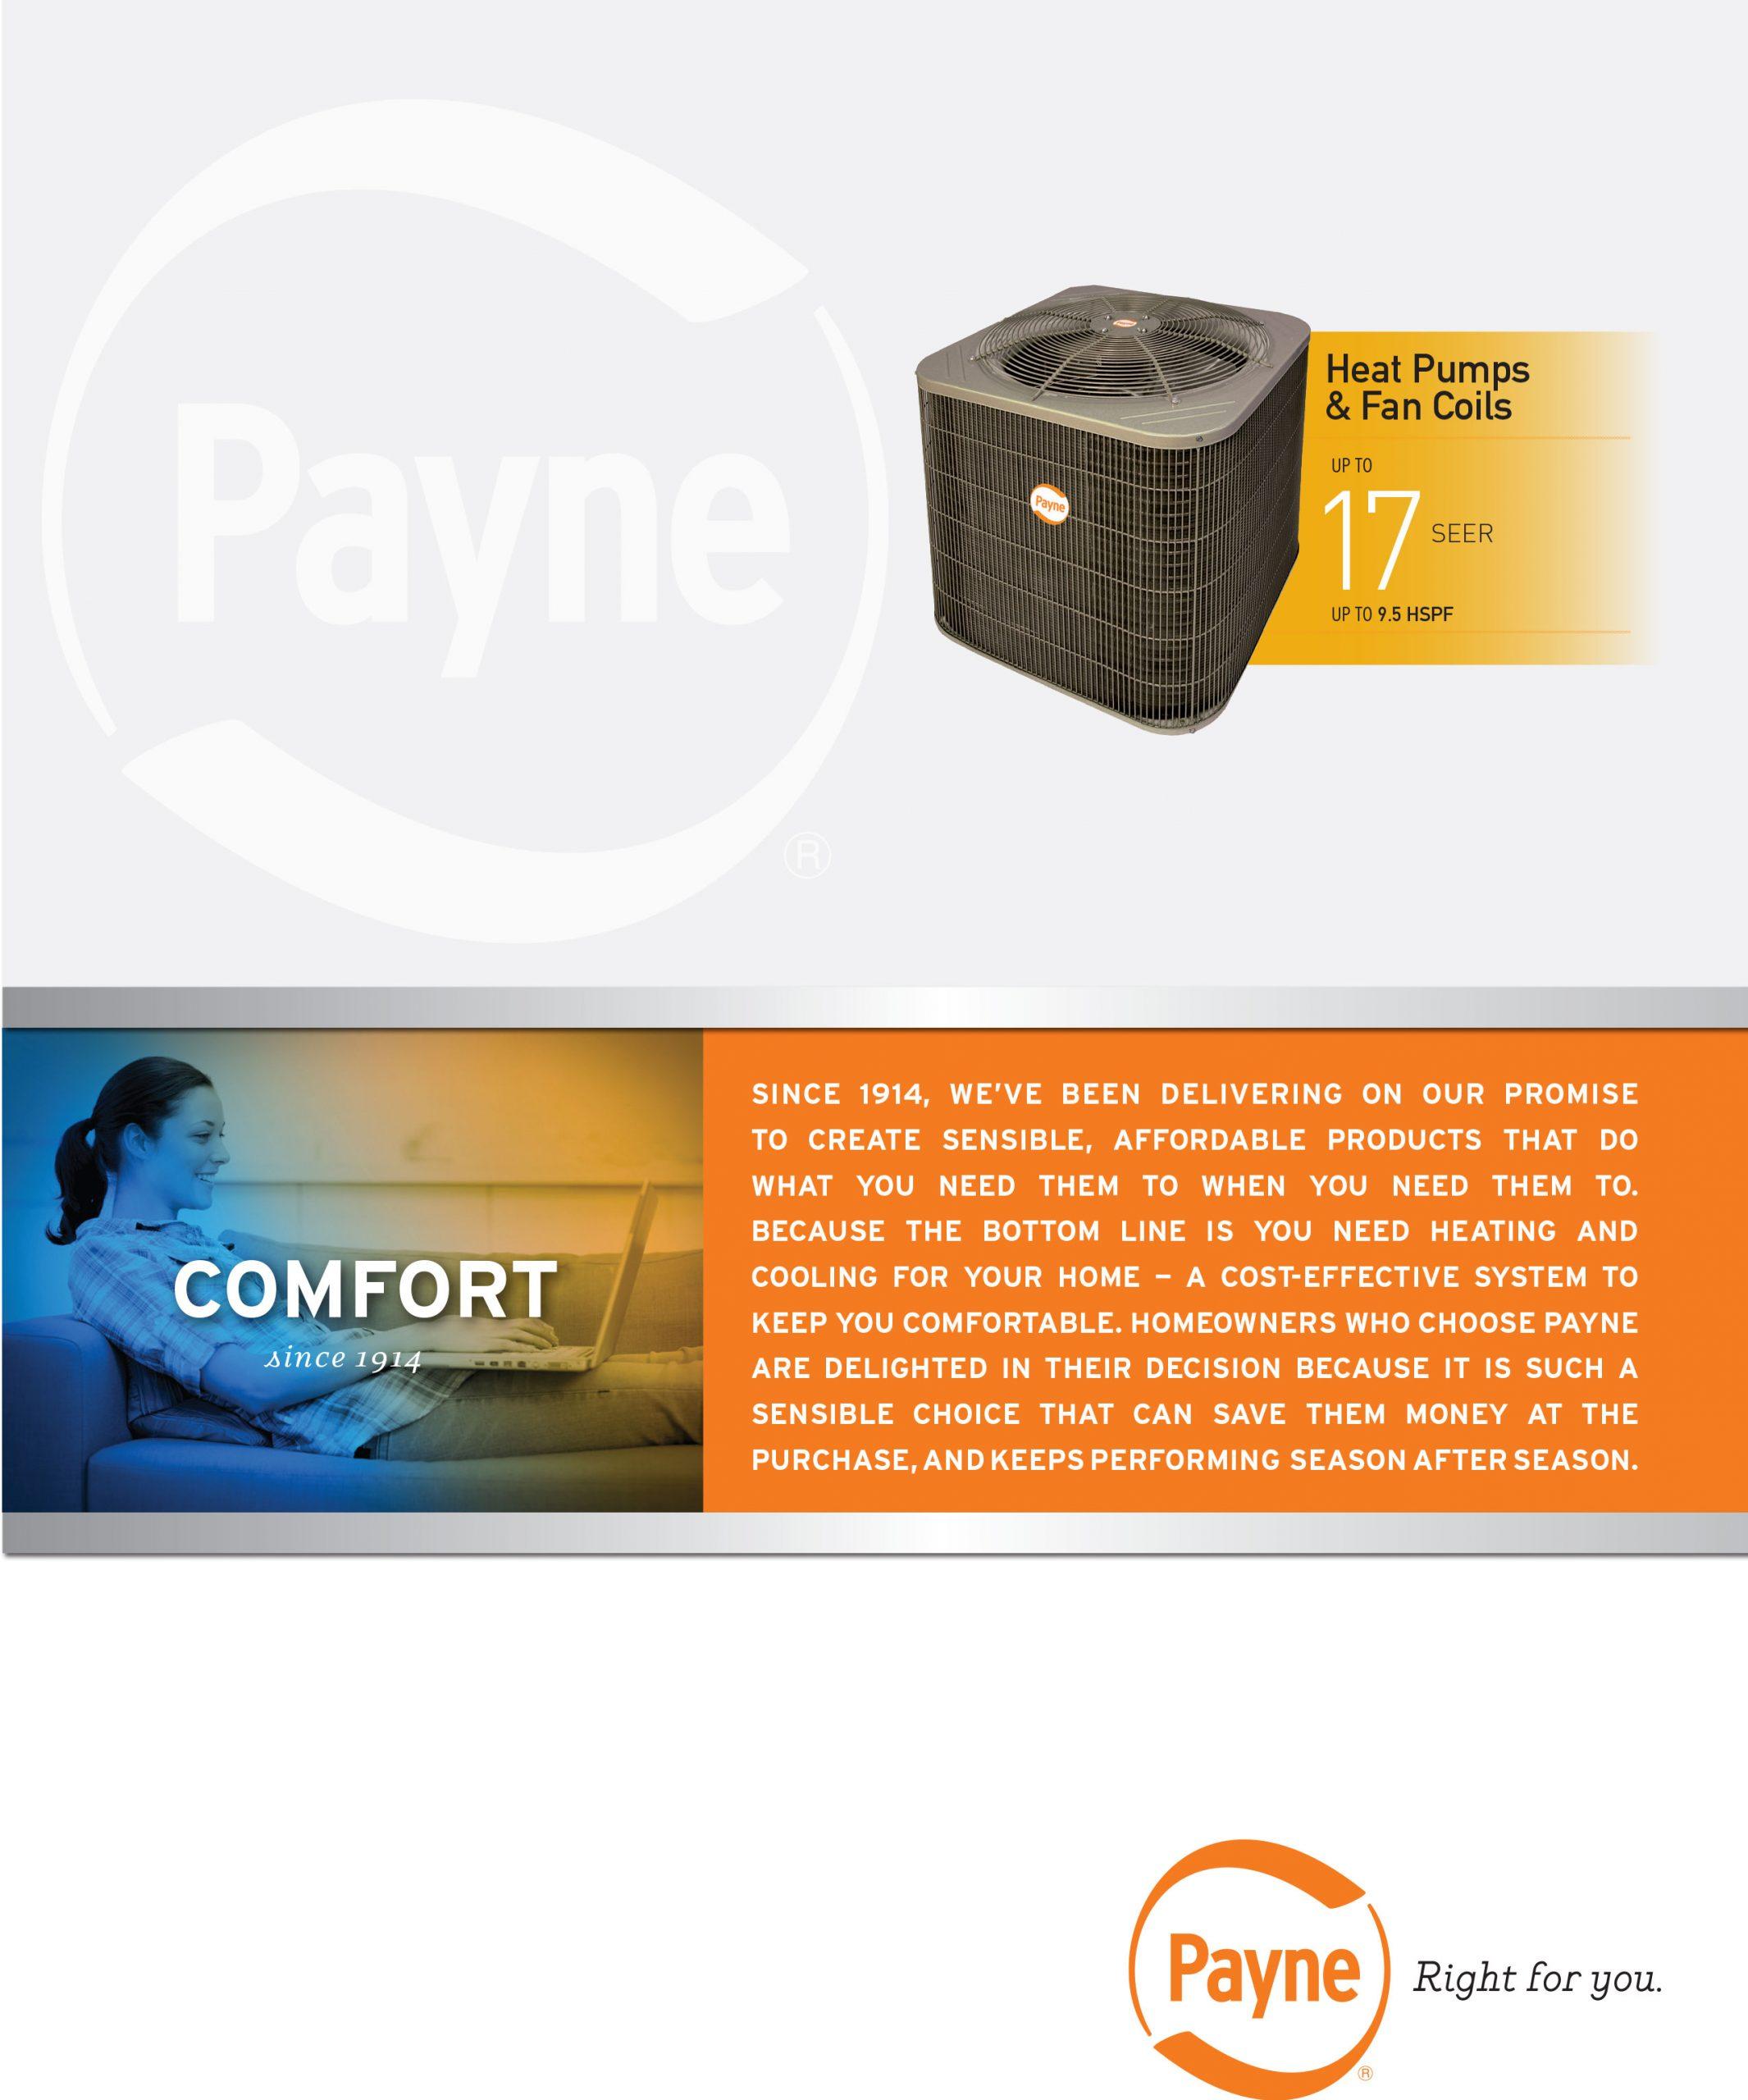 Budget Series Heat Pumps